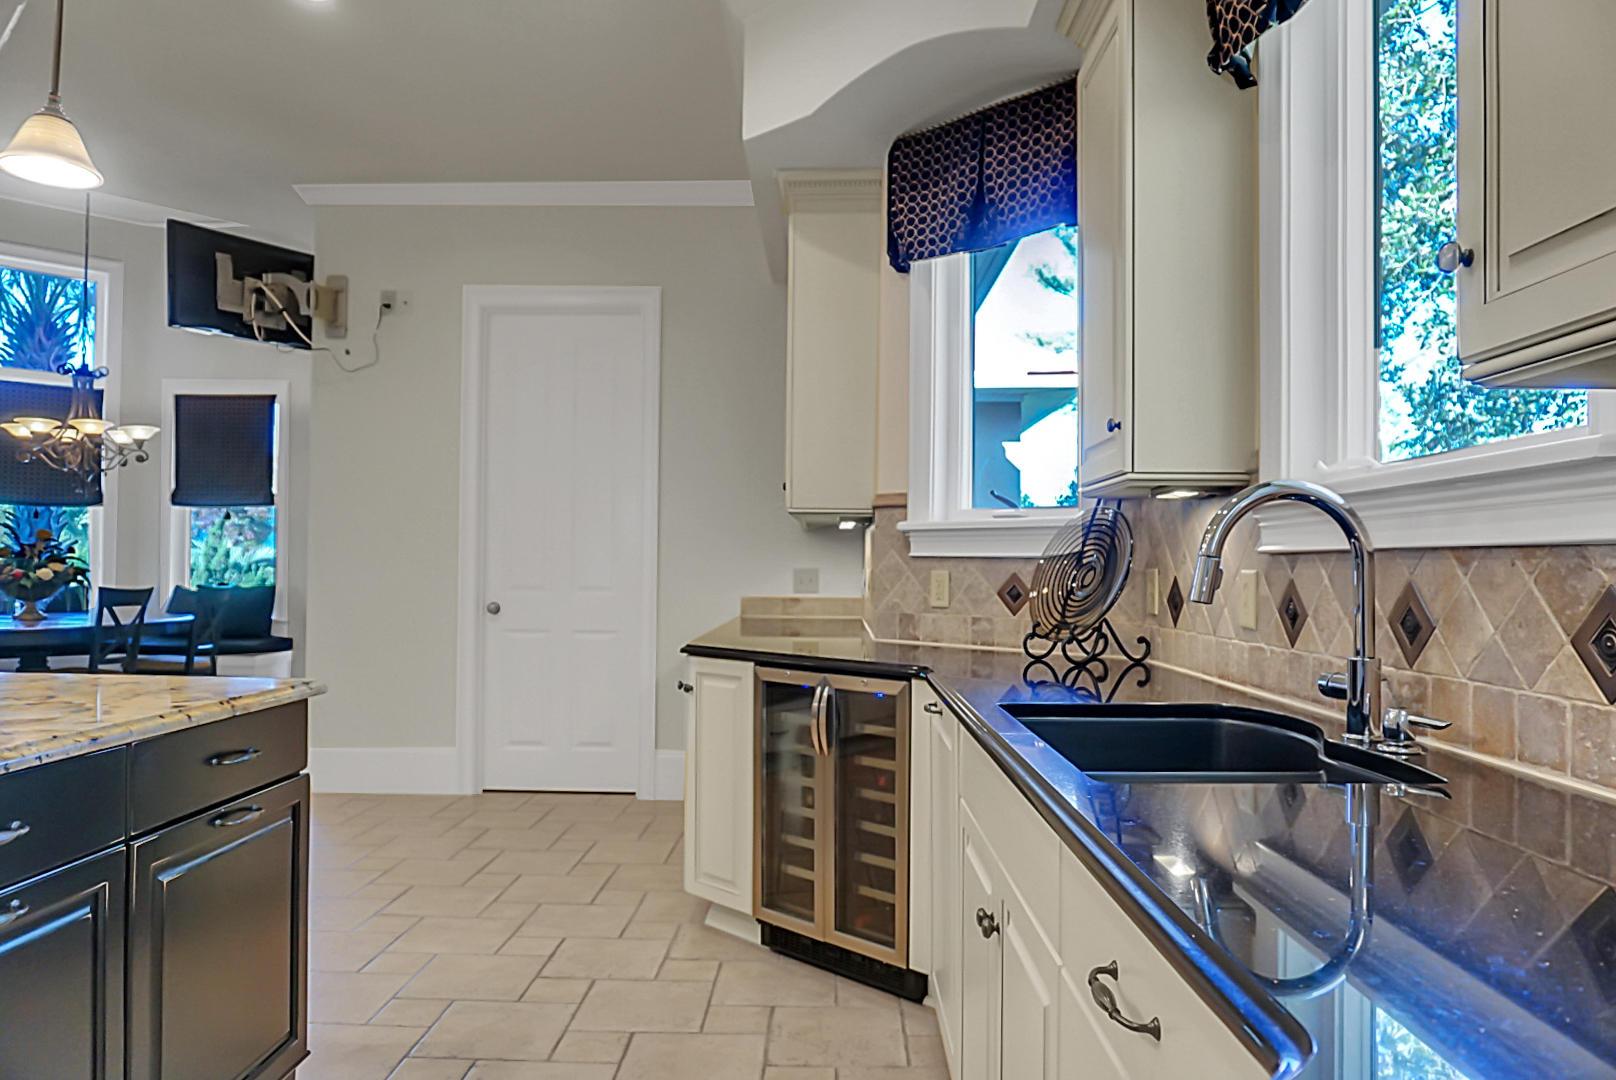 Dunes West Homes For Sale - 2389 Darts Cove, Mount Pleasant, SC - 53